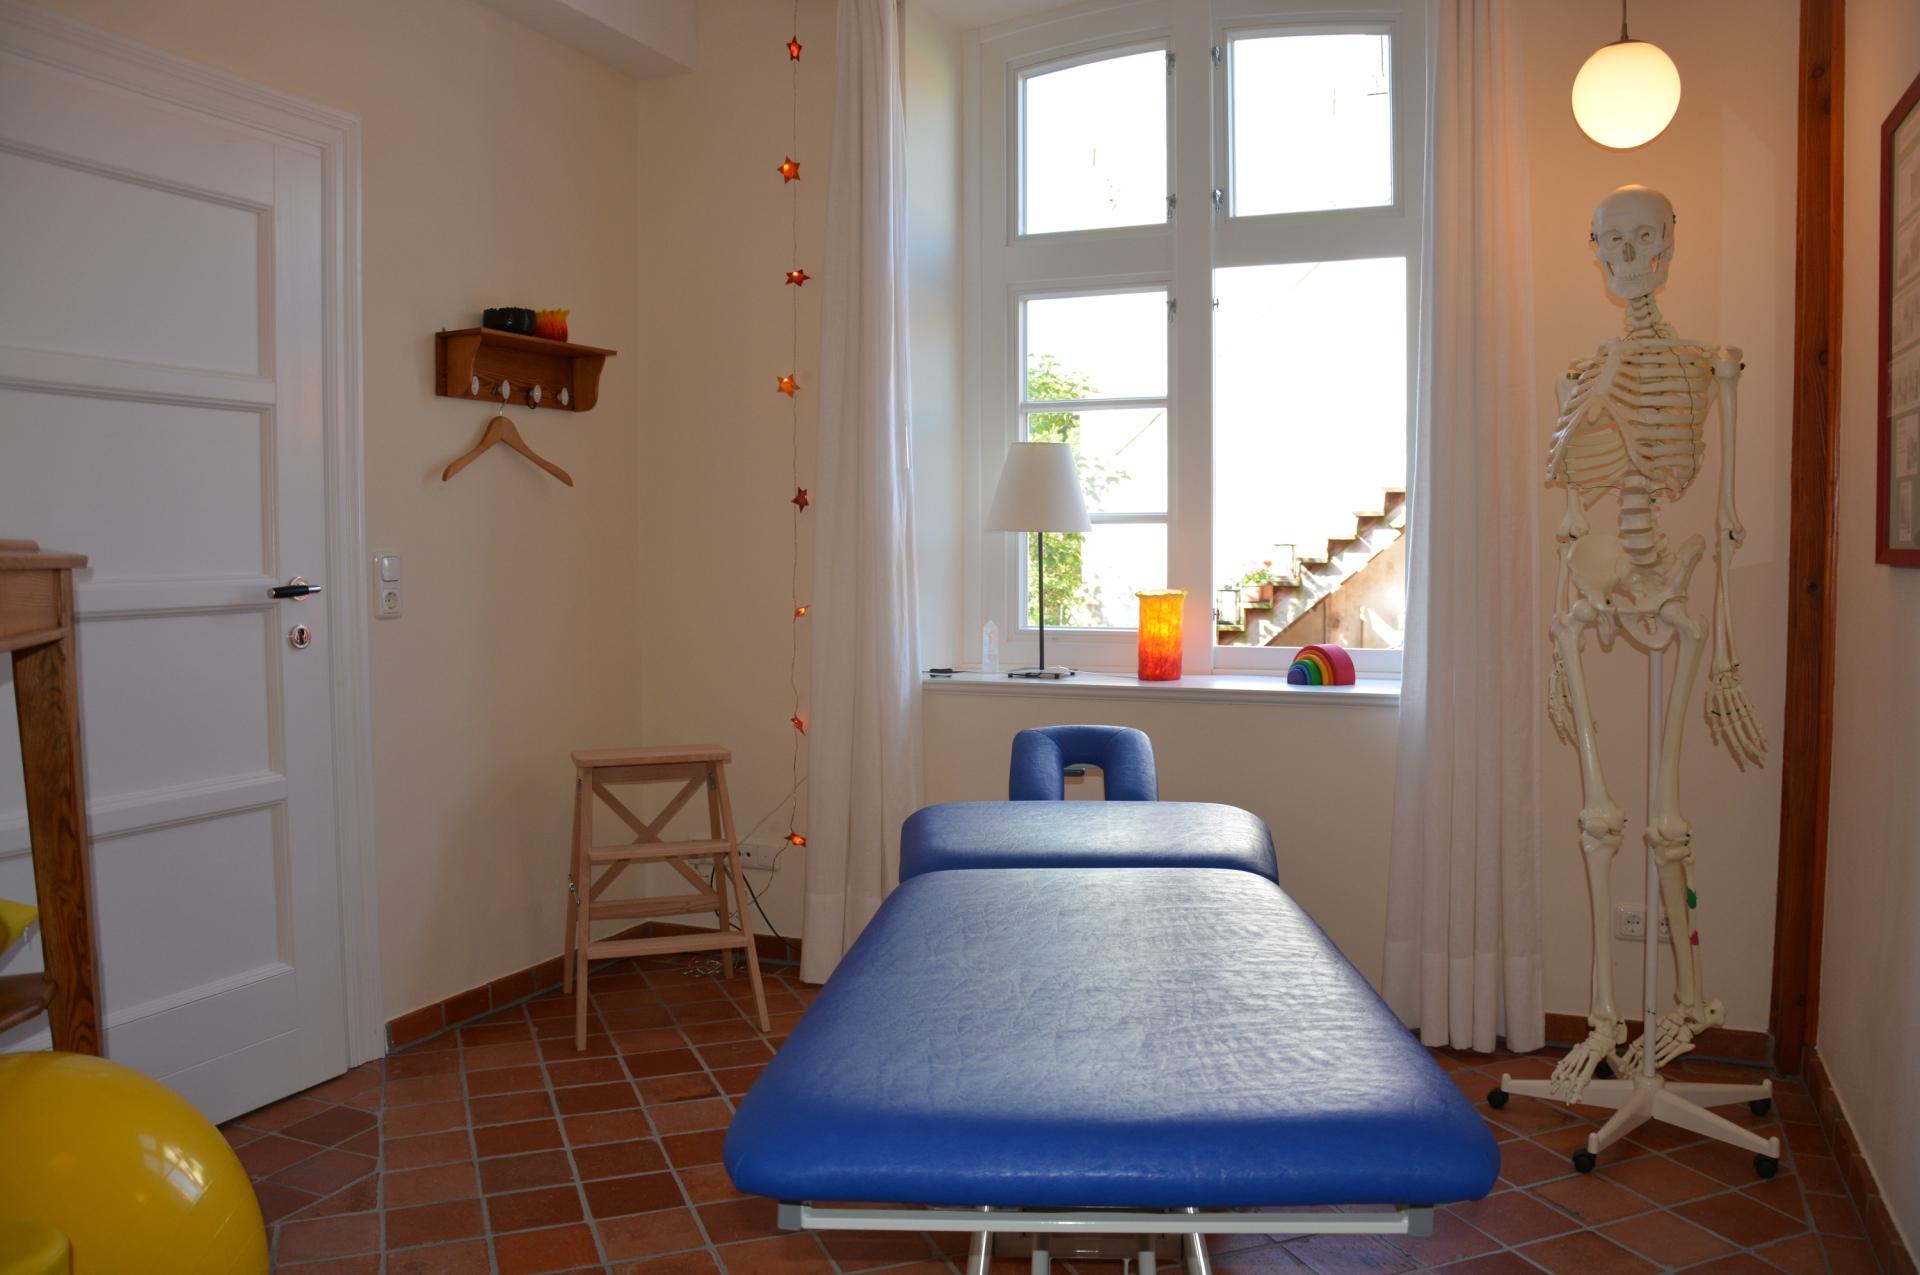 physiotherapie-krankengymnastik-moelln